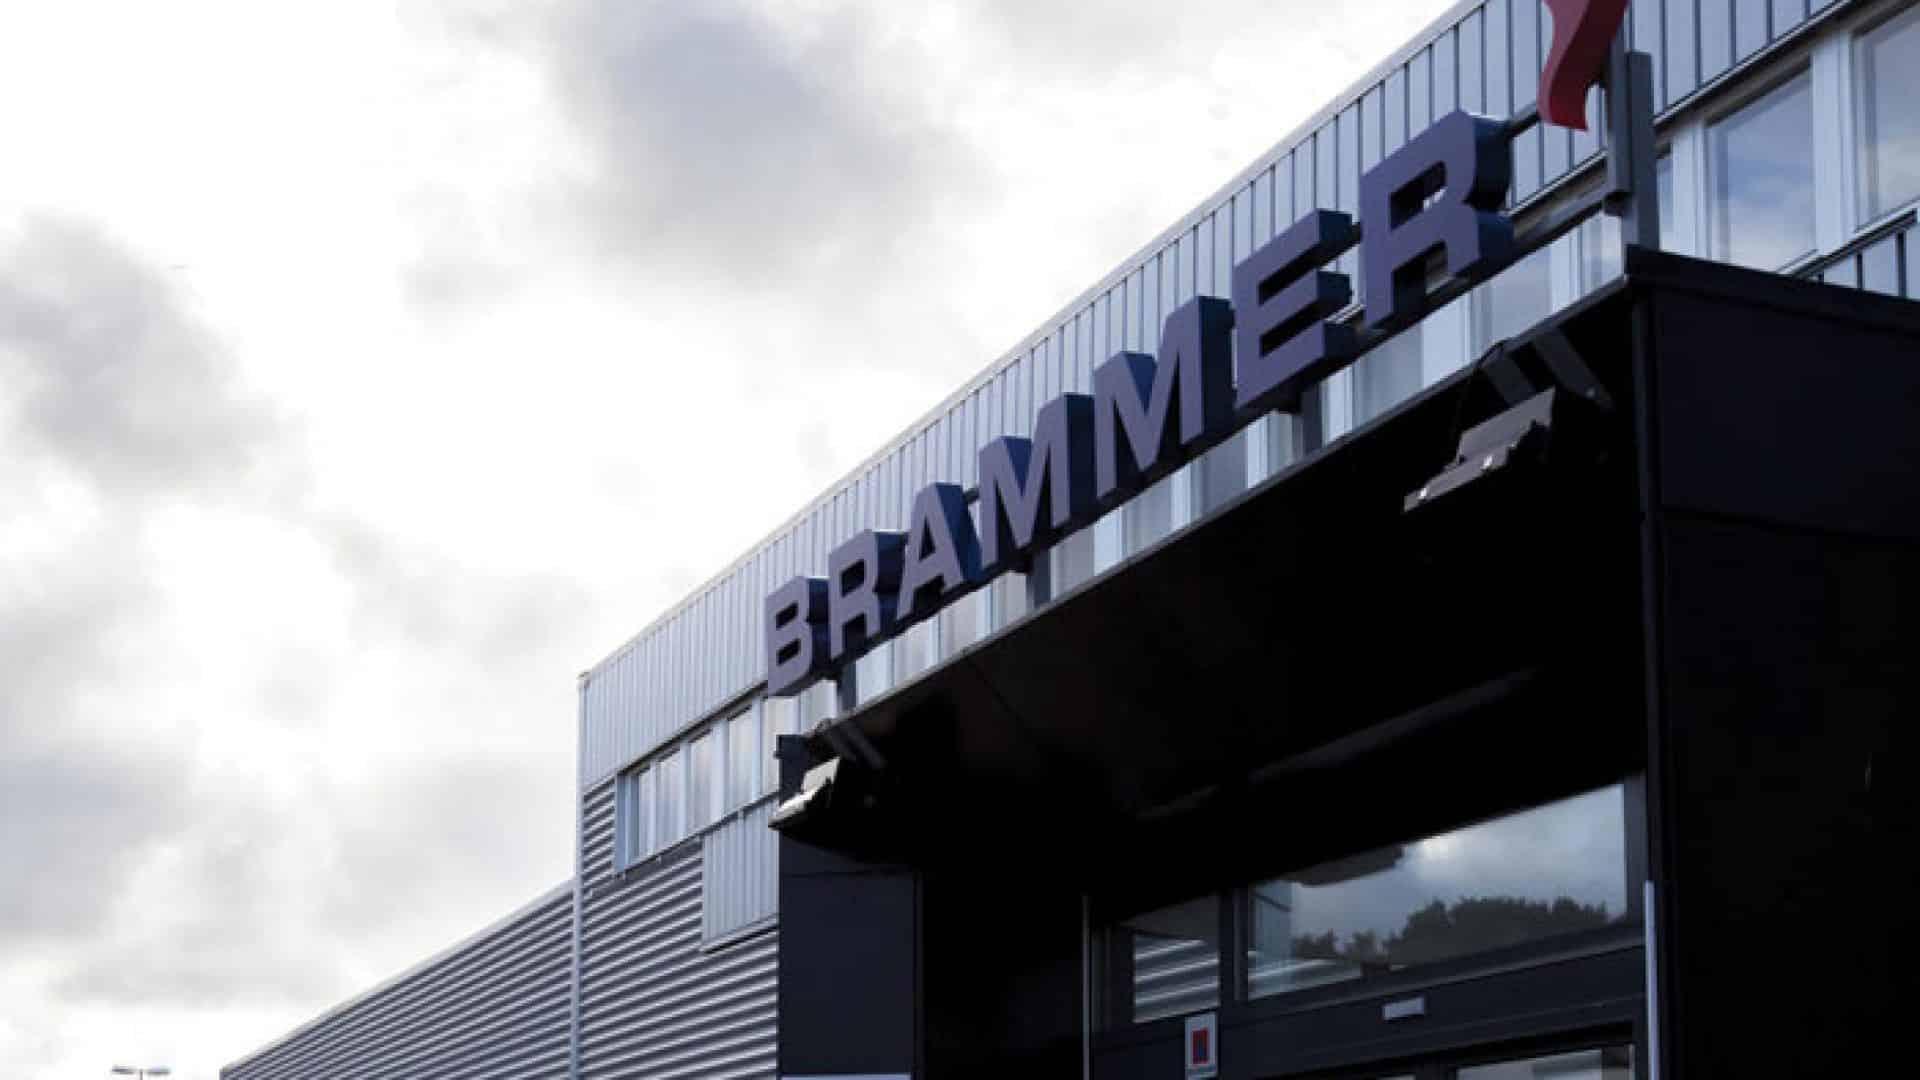 Brammer